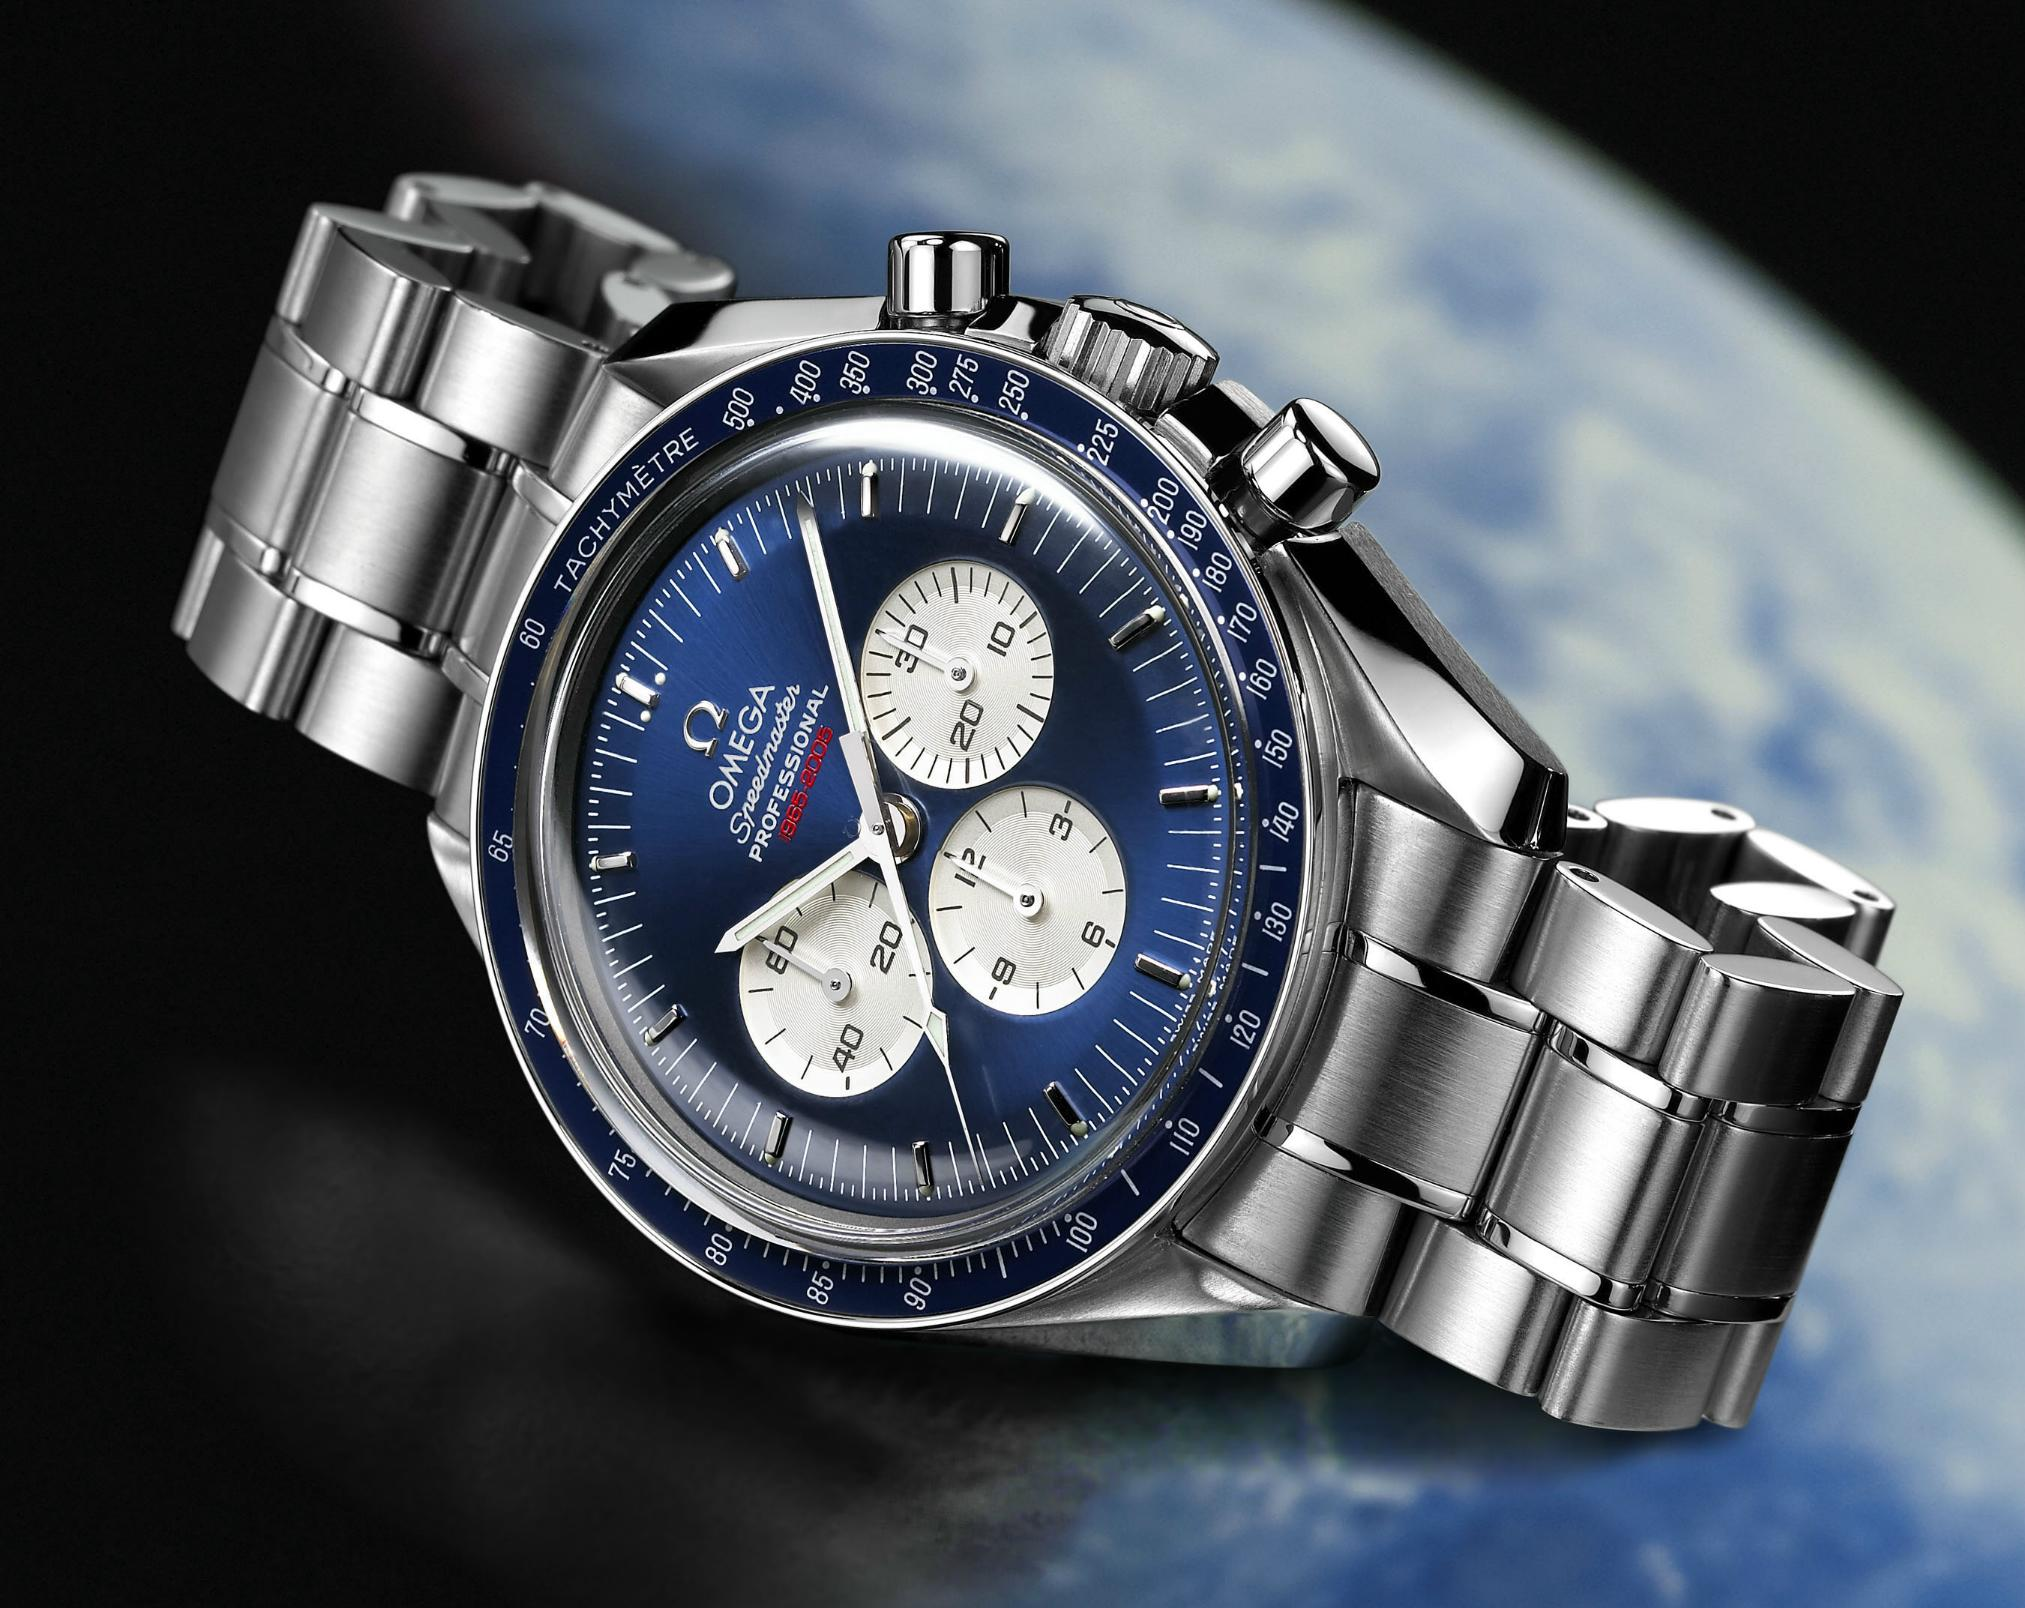 Omega Speedmaster Gemini 4 Special (Limited) Edition: